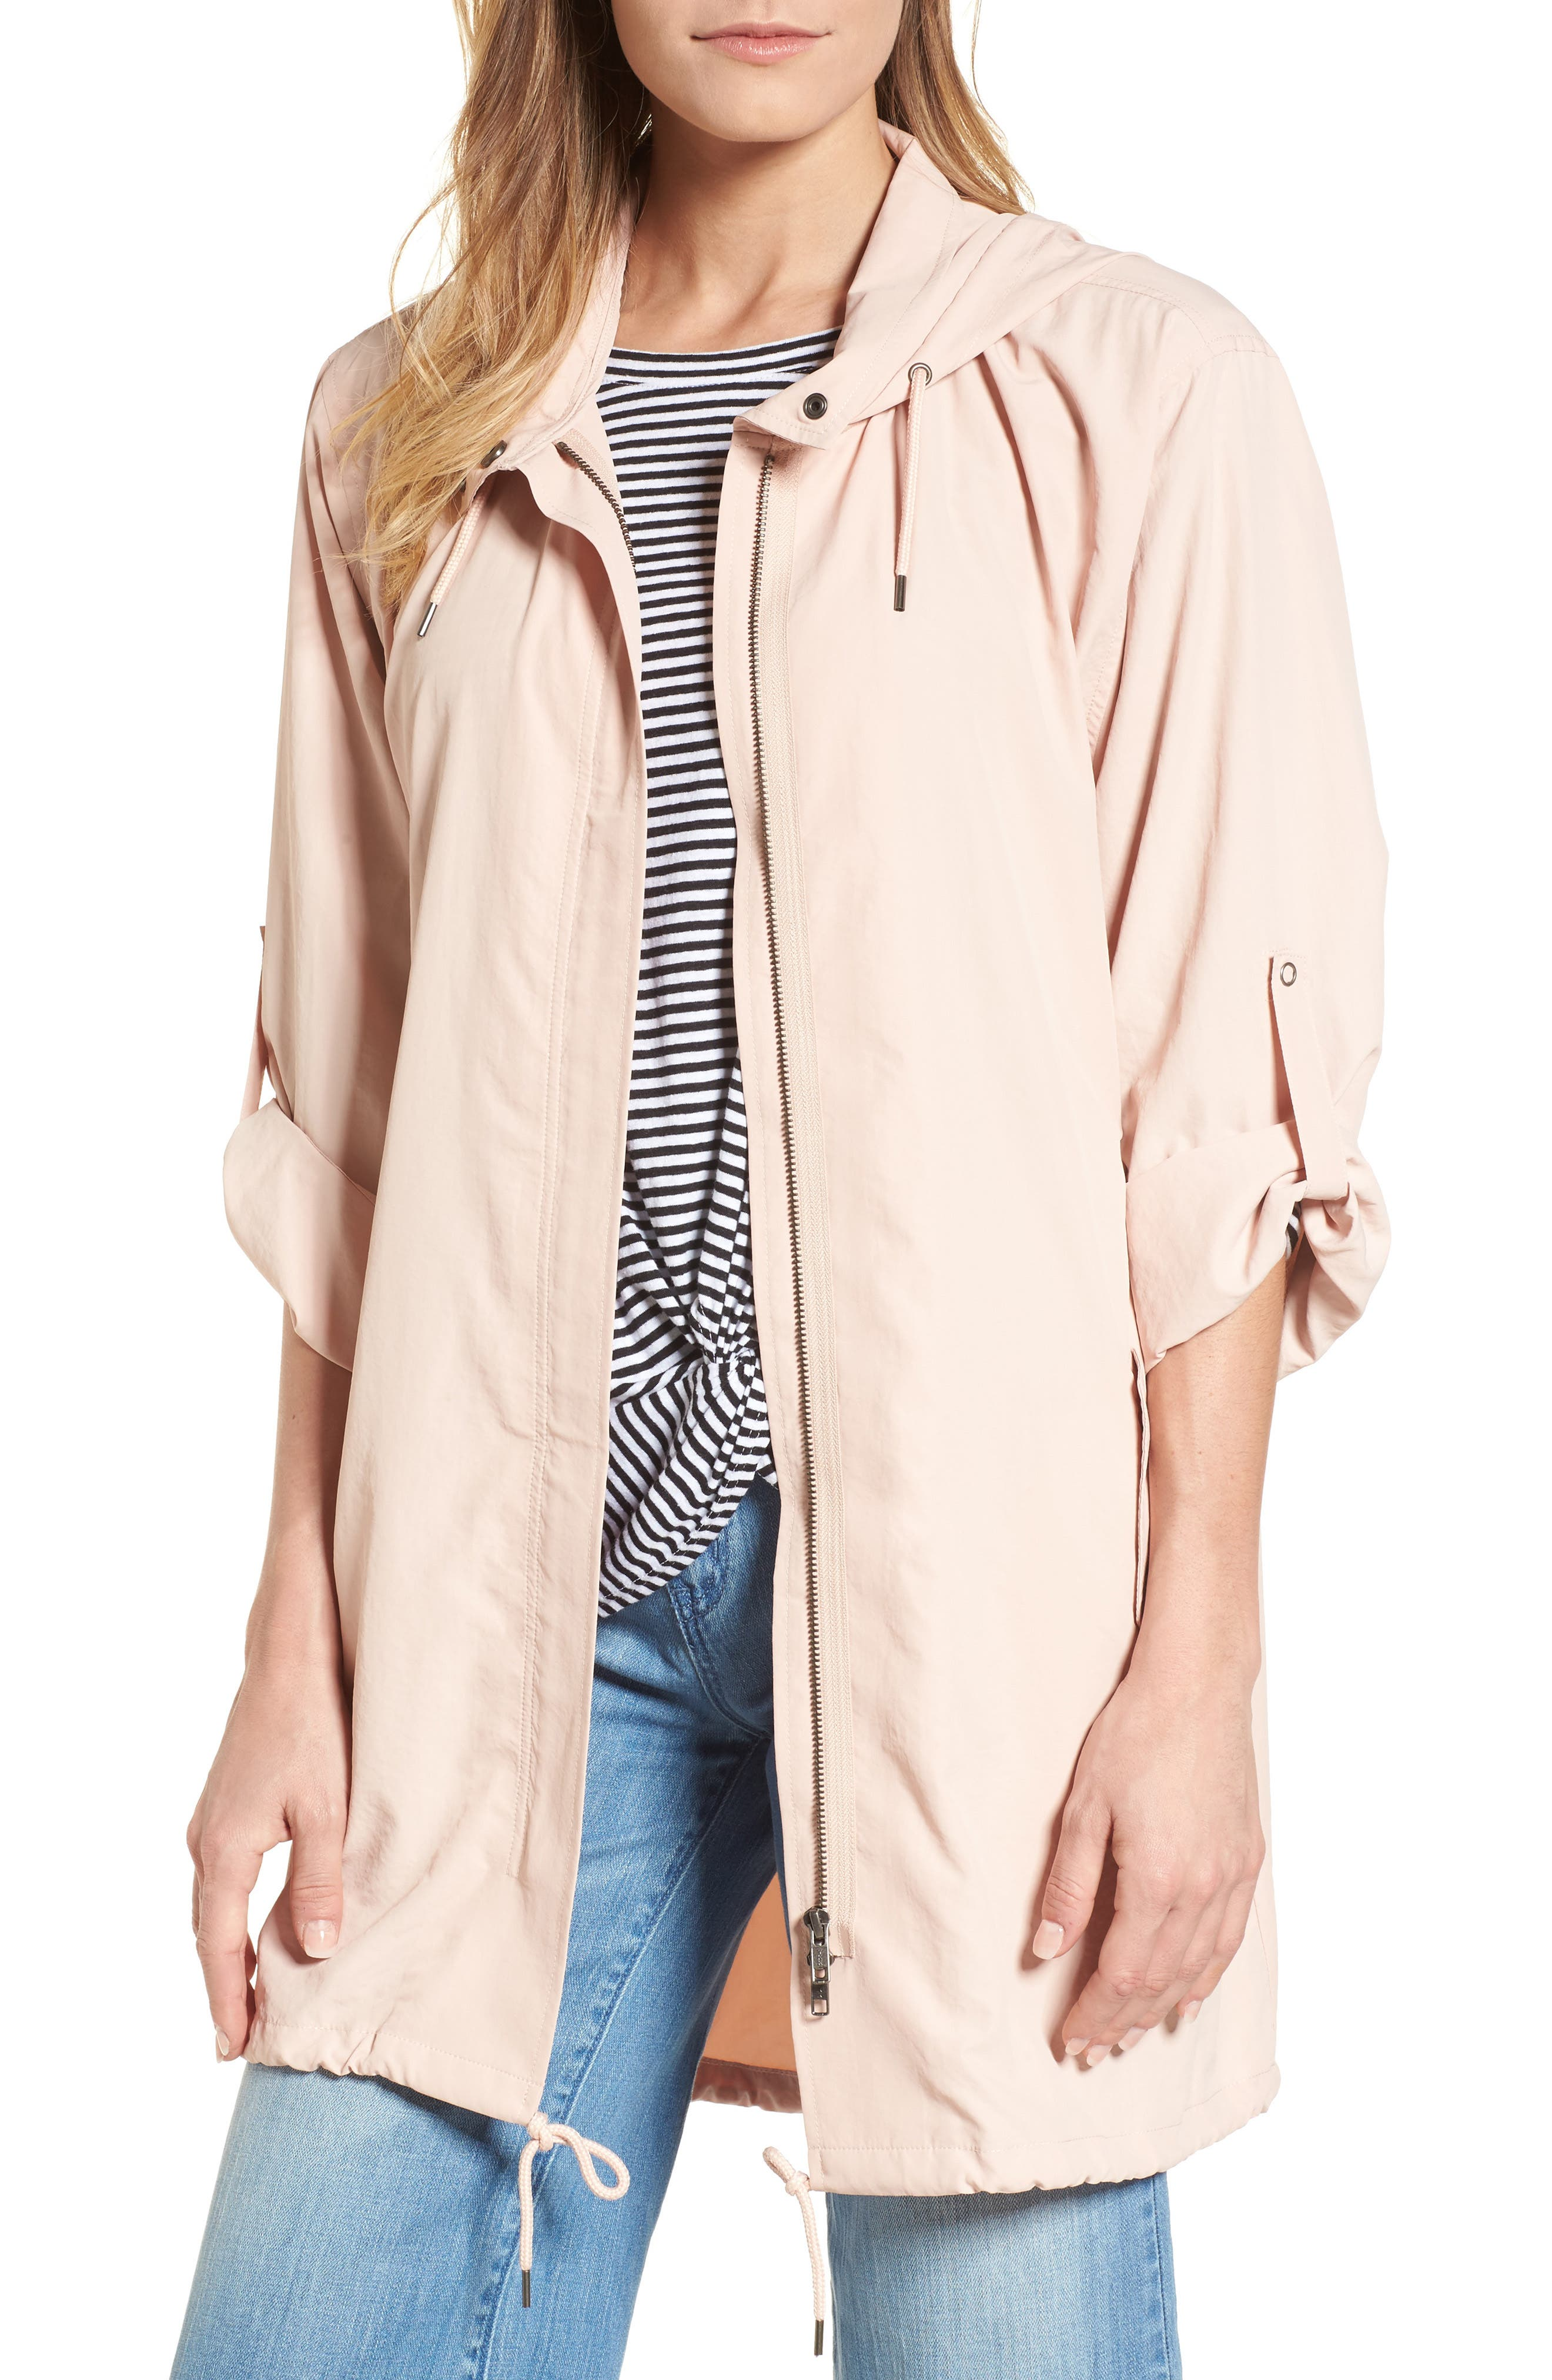 Alternate Image 1 Selected - Caslon® Tumbled Anorak Jacket (Regular & Petite)